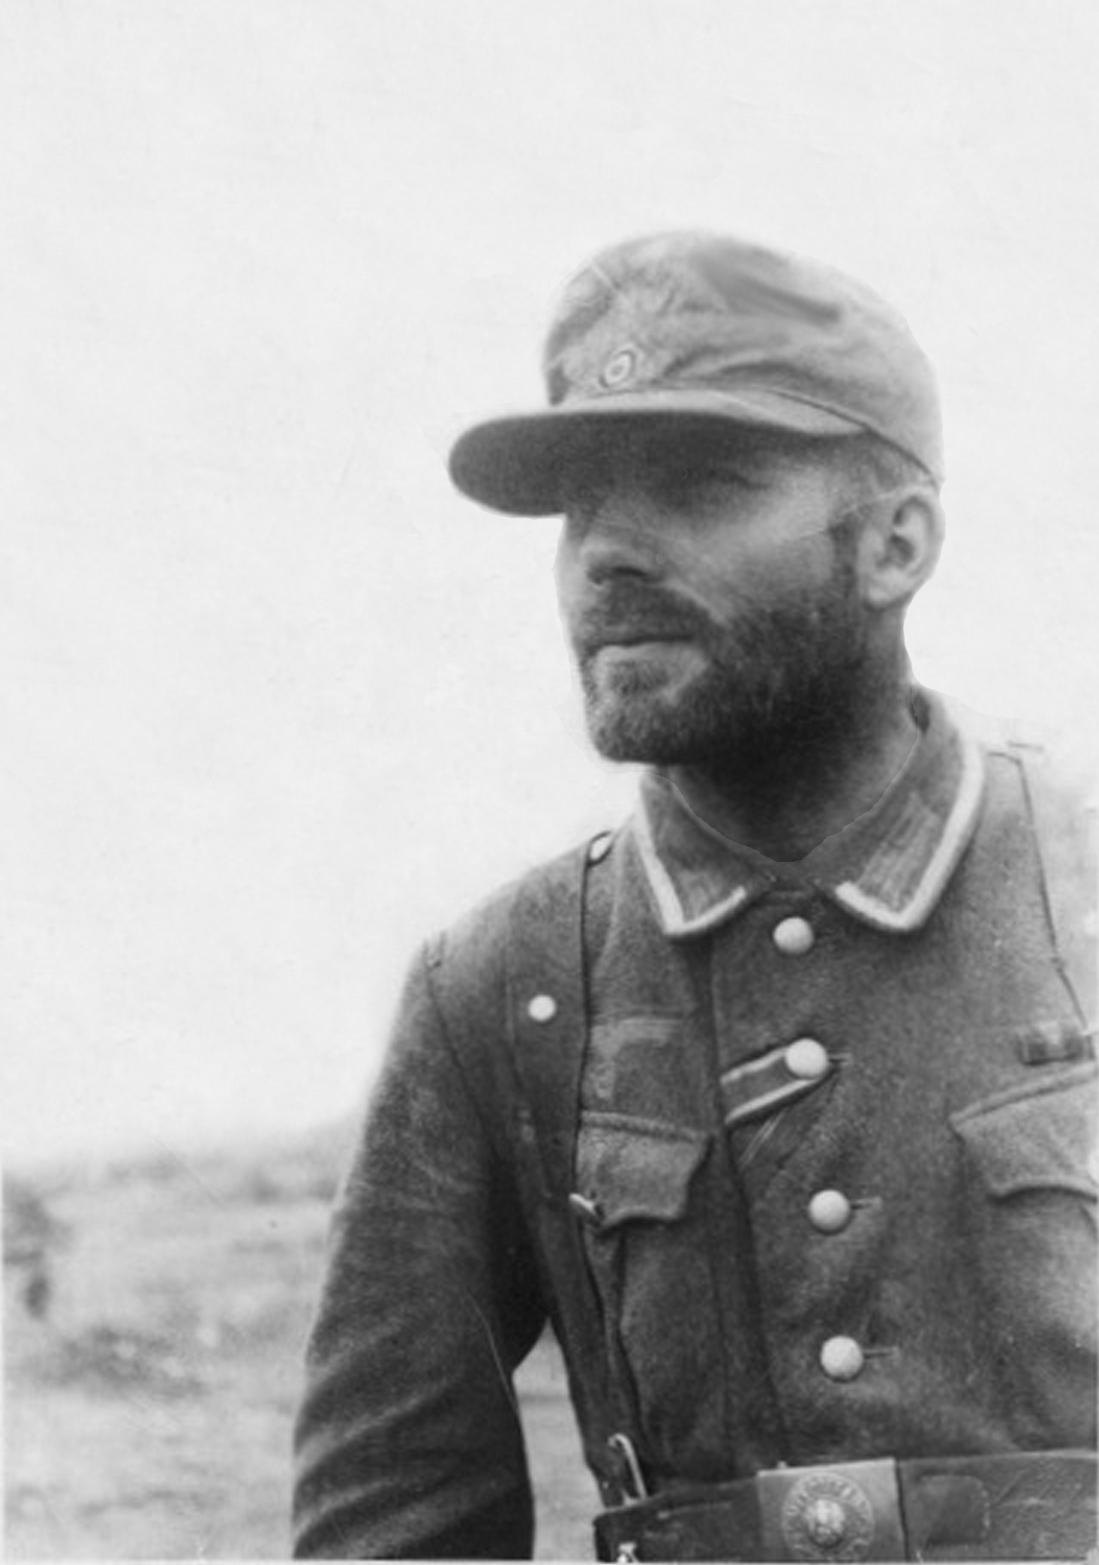 In combat near Kharkov, June 1943.